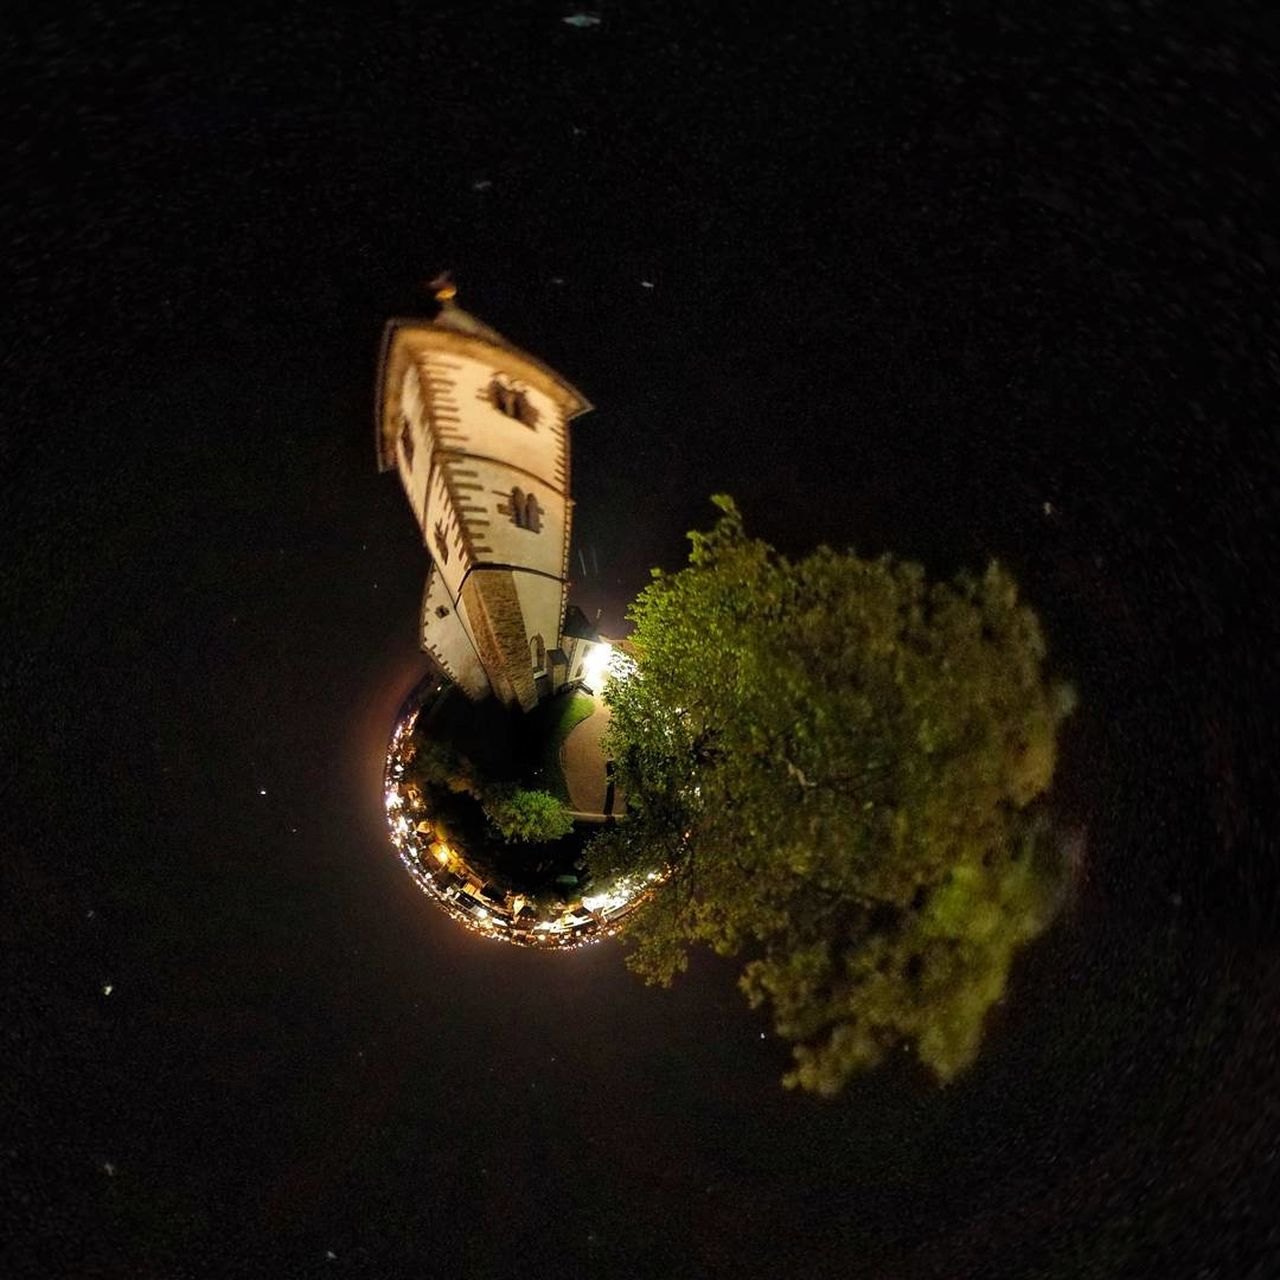 Night Outdoors No People Illuminated Water Sky Astronomy Miniplanet MiniPlants Ricohthetas Ricohtheta Ricoh